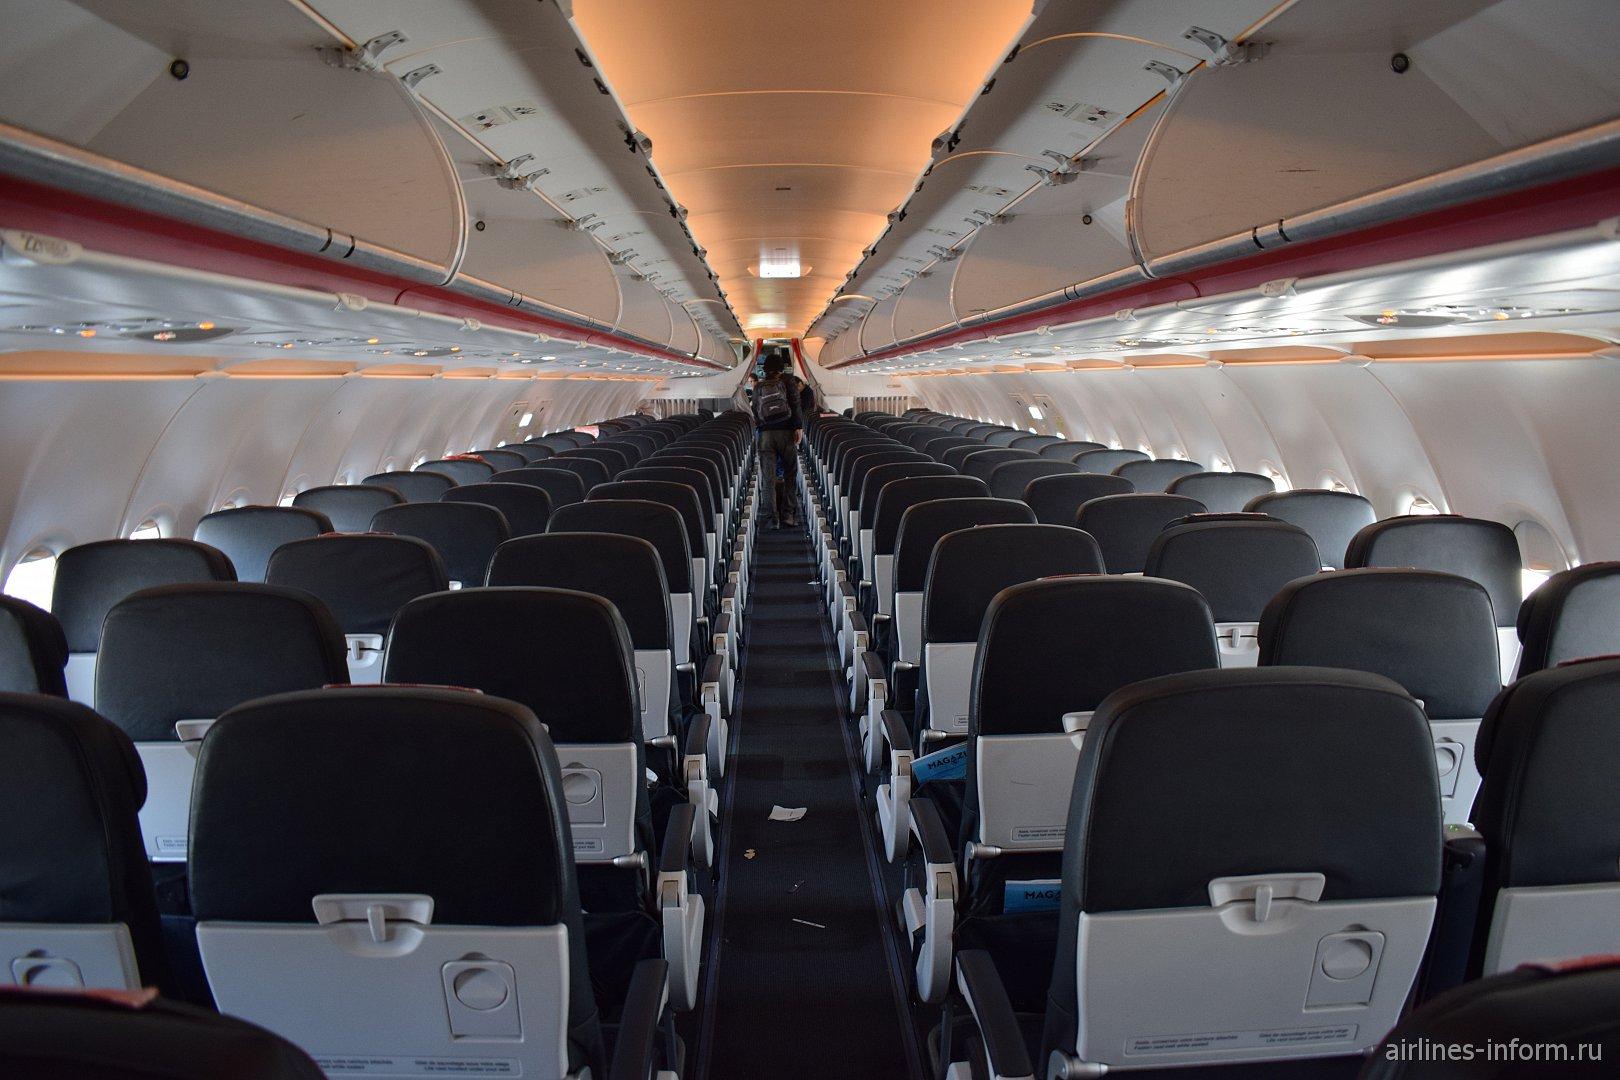 Пассажирский салон самолета Airbus A320 авиакомпании Air France